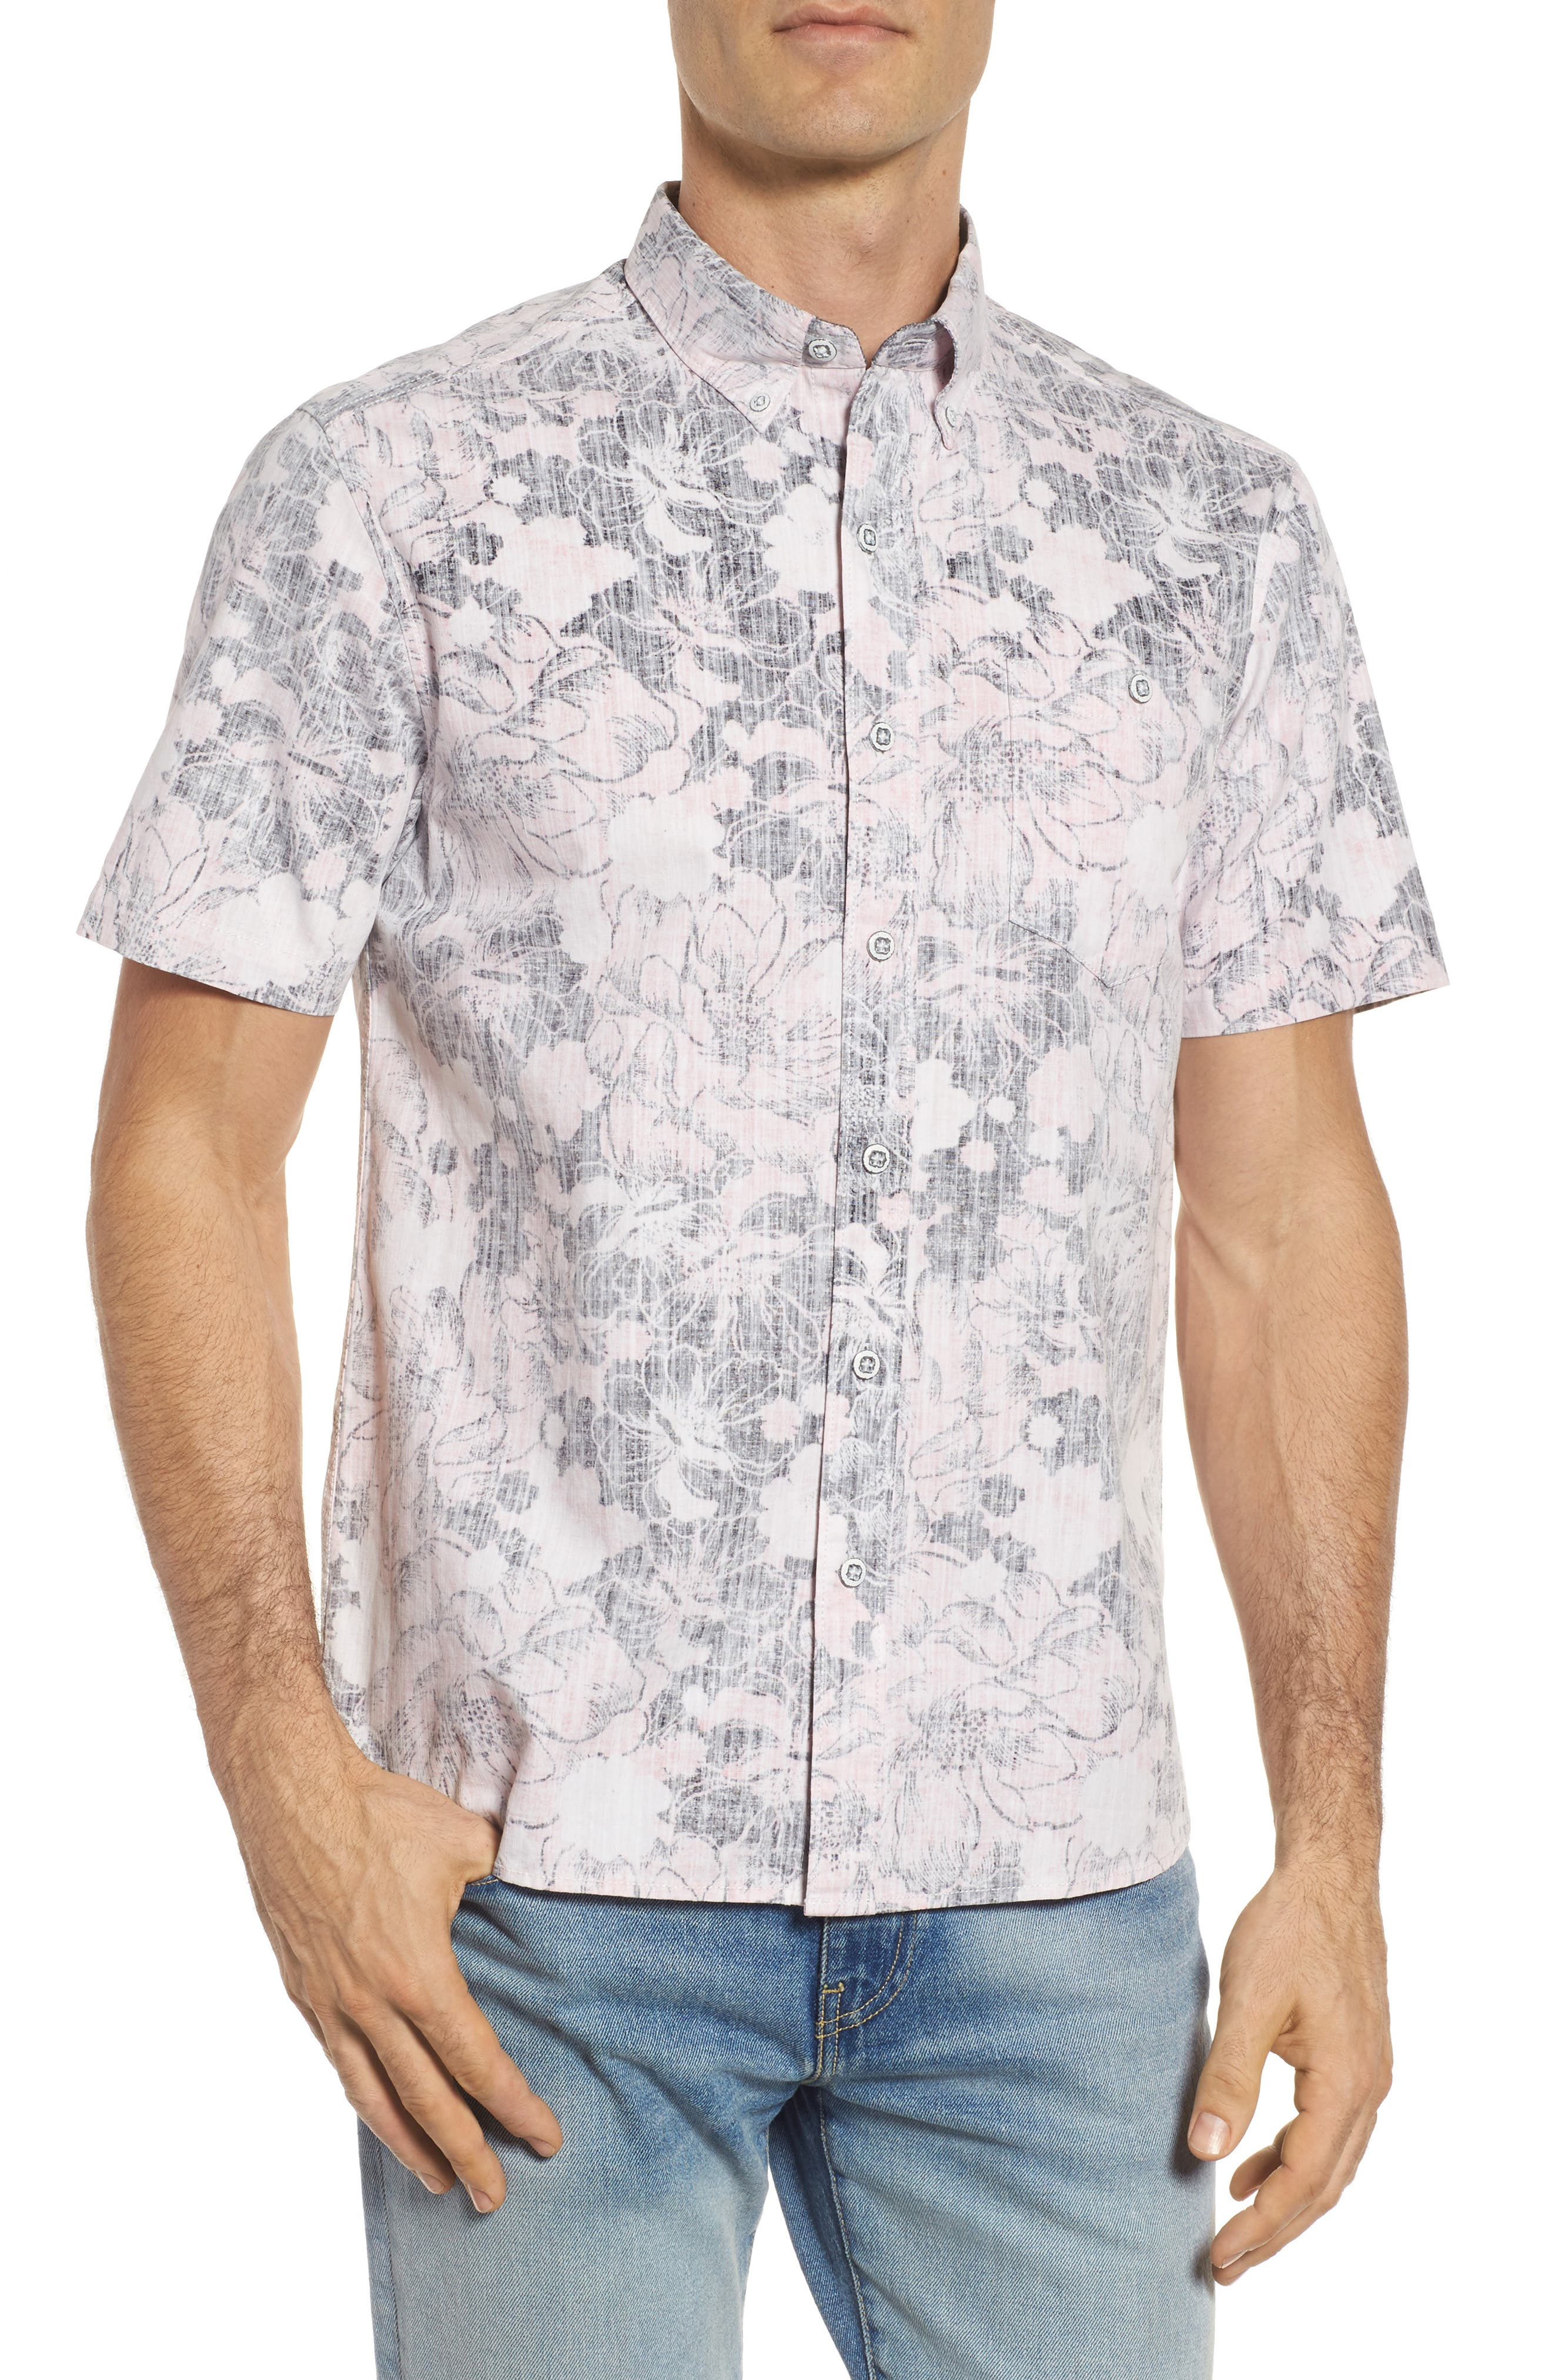 Alternate Image 1 Selected - Tommy Bahama Seaspray Floral Cotton & Linen Sport Shirt